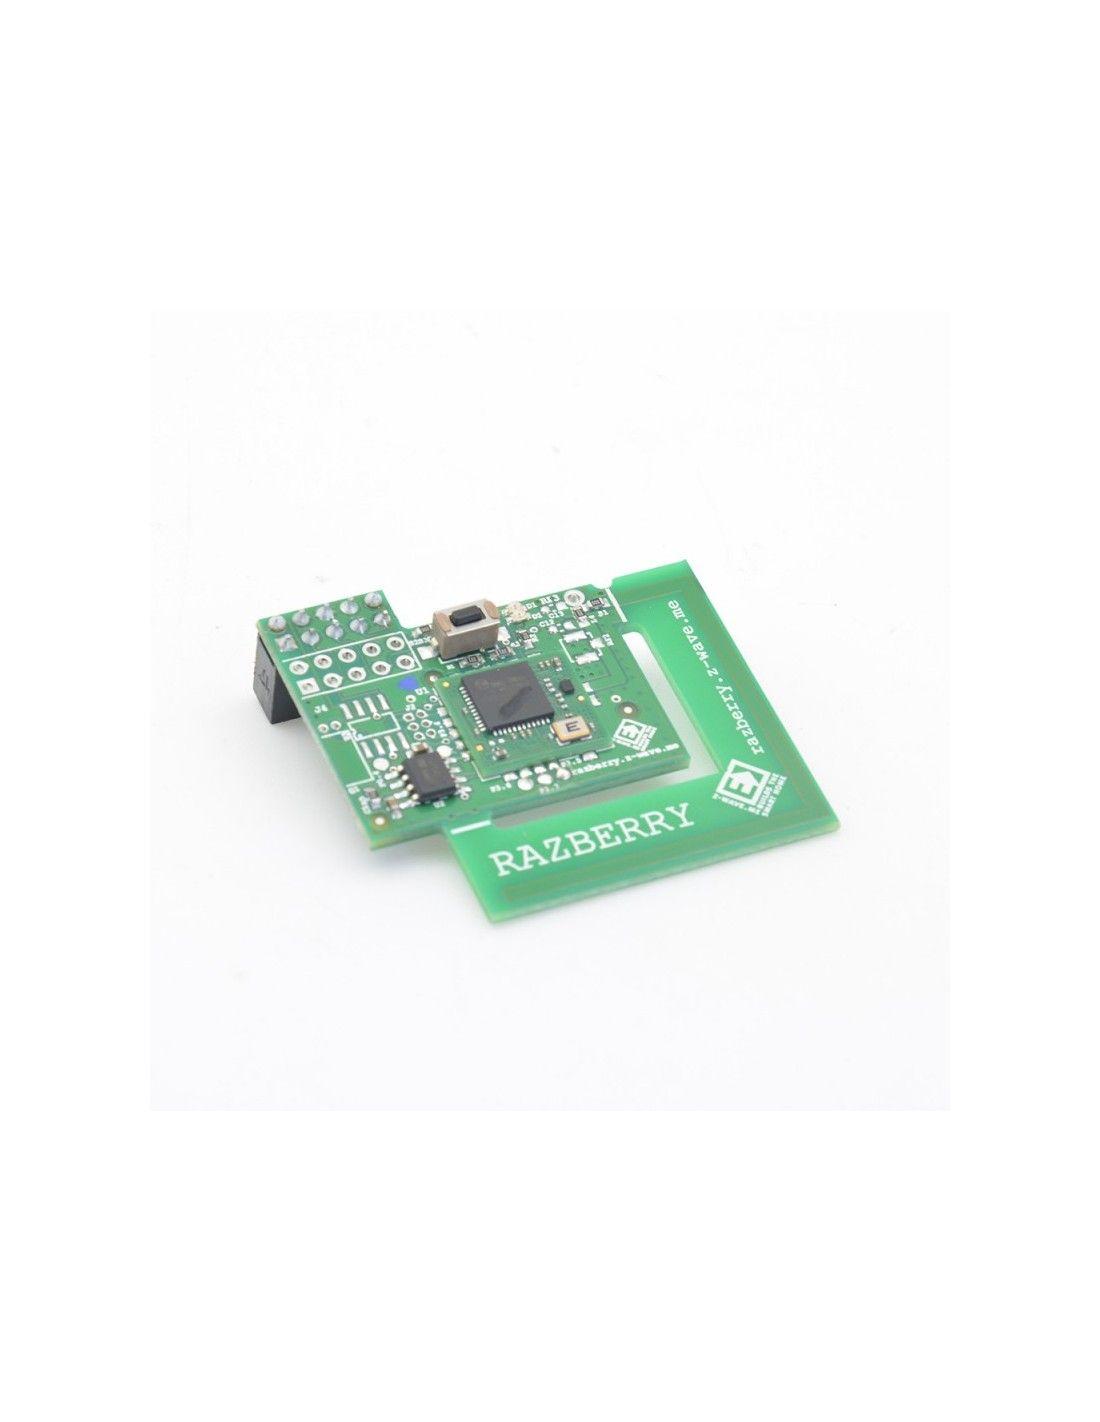 Z-Wave Me - RaZberry 2 Z-Wave+ expansion board for